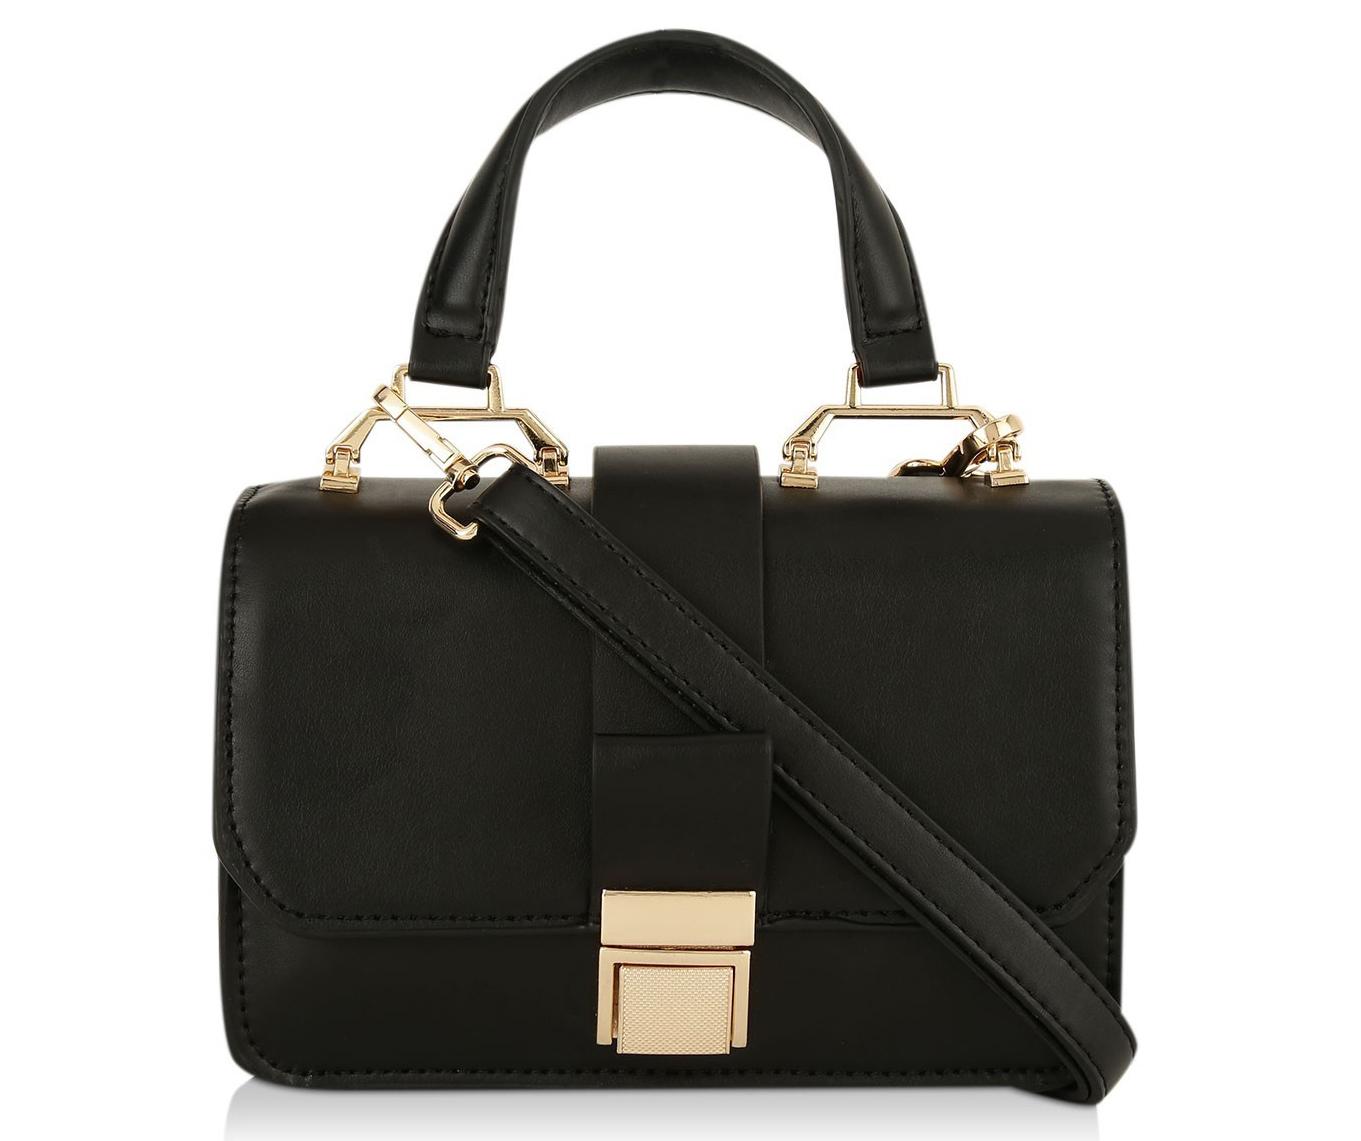 CELEBRITI-Buckle-Front-Handbag